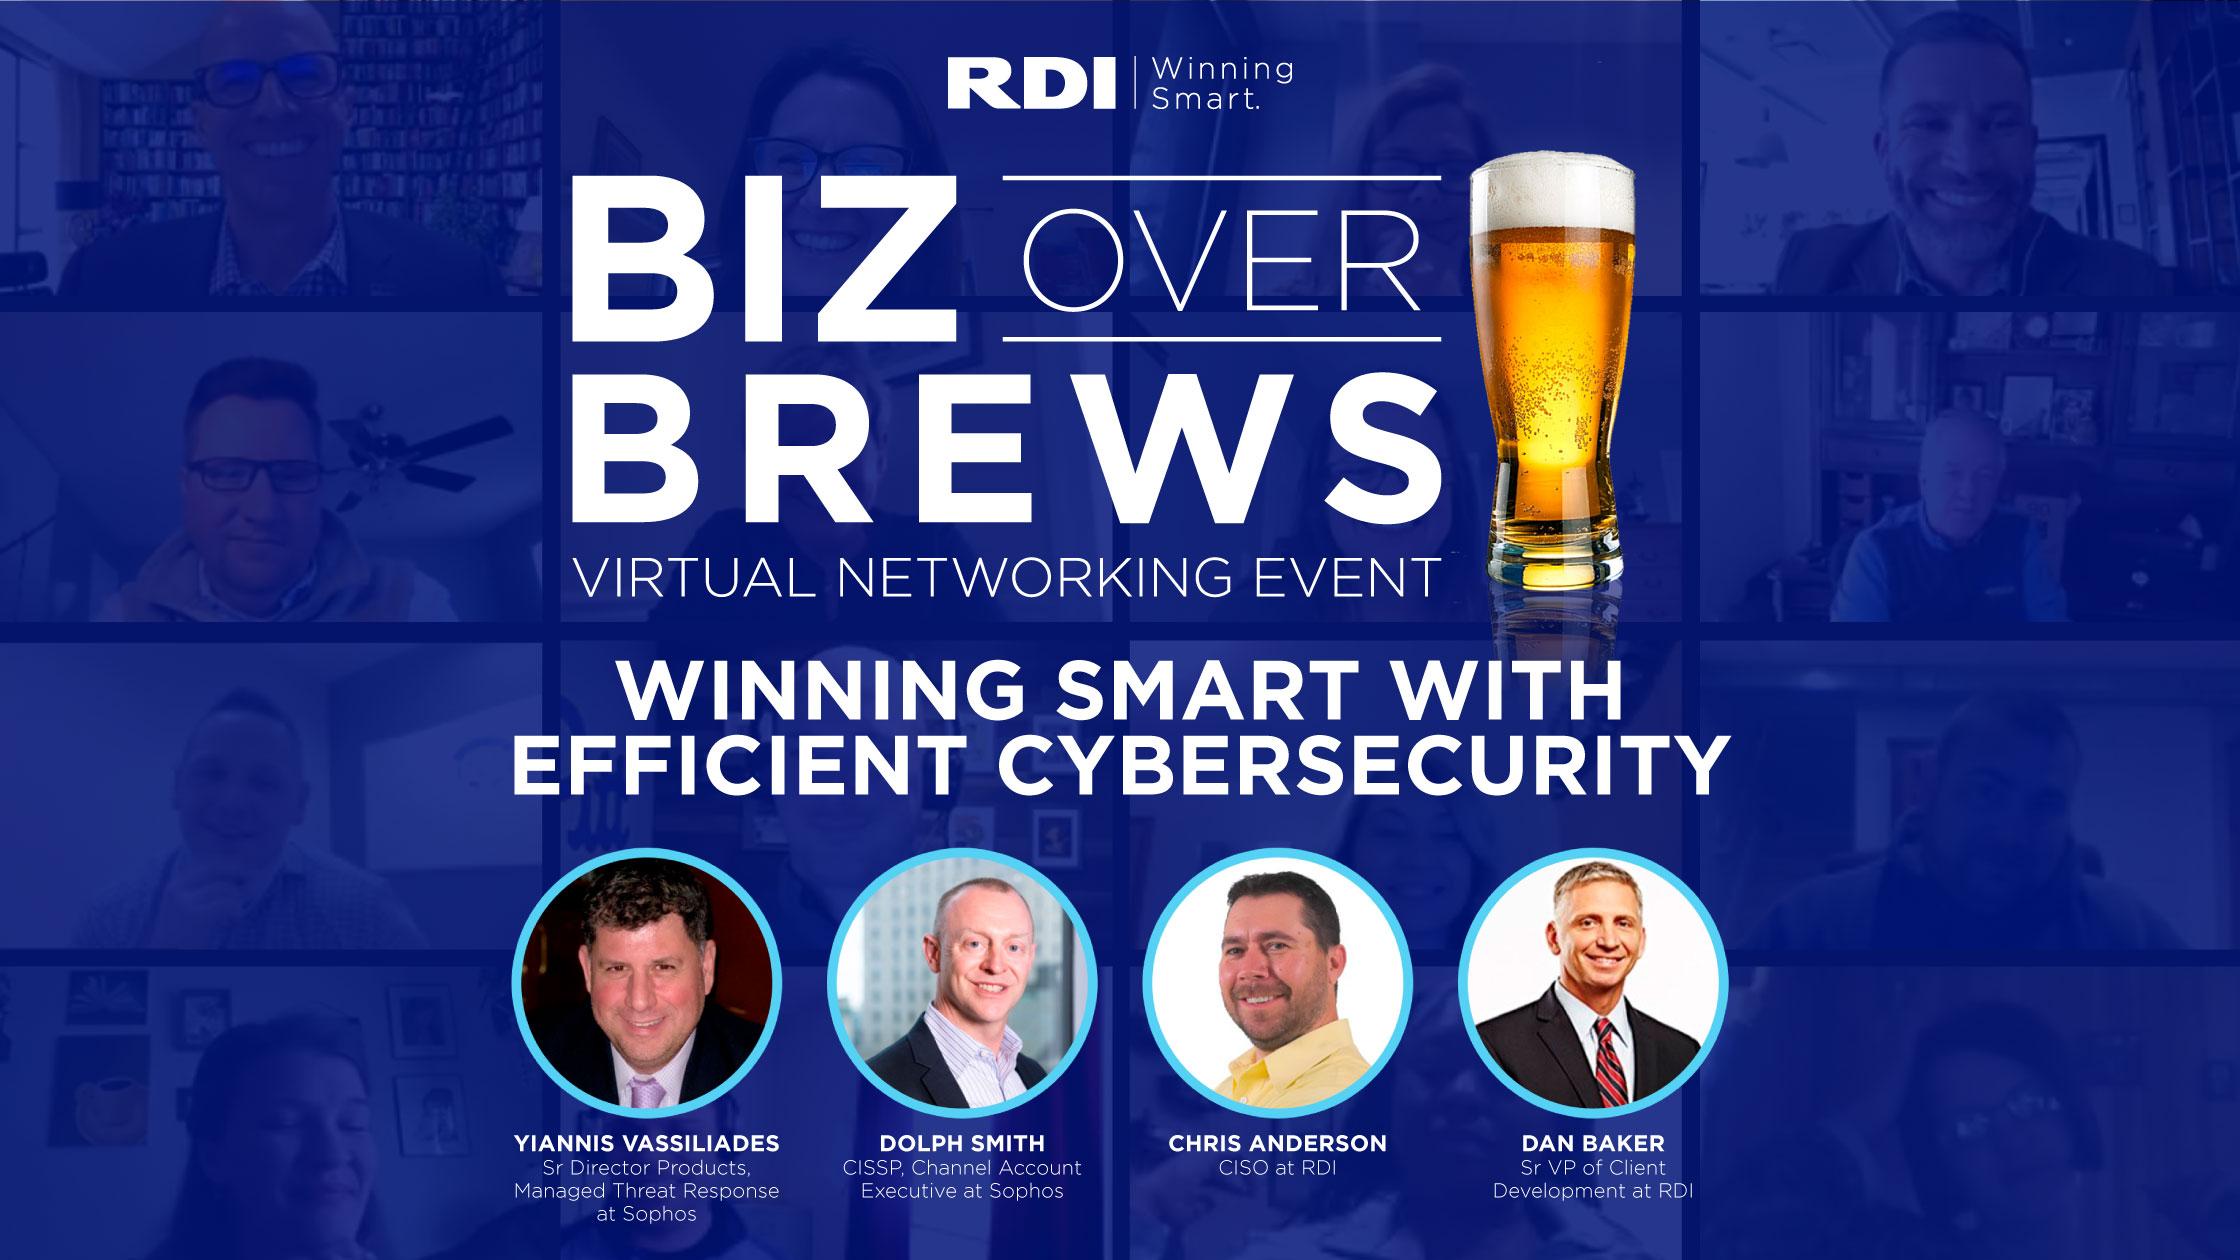 RDI Corporation - Biz Over Brews Winning Smart with Efficient Cybersecurity